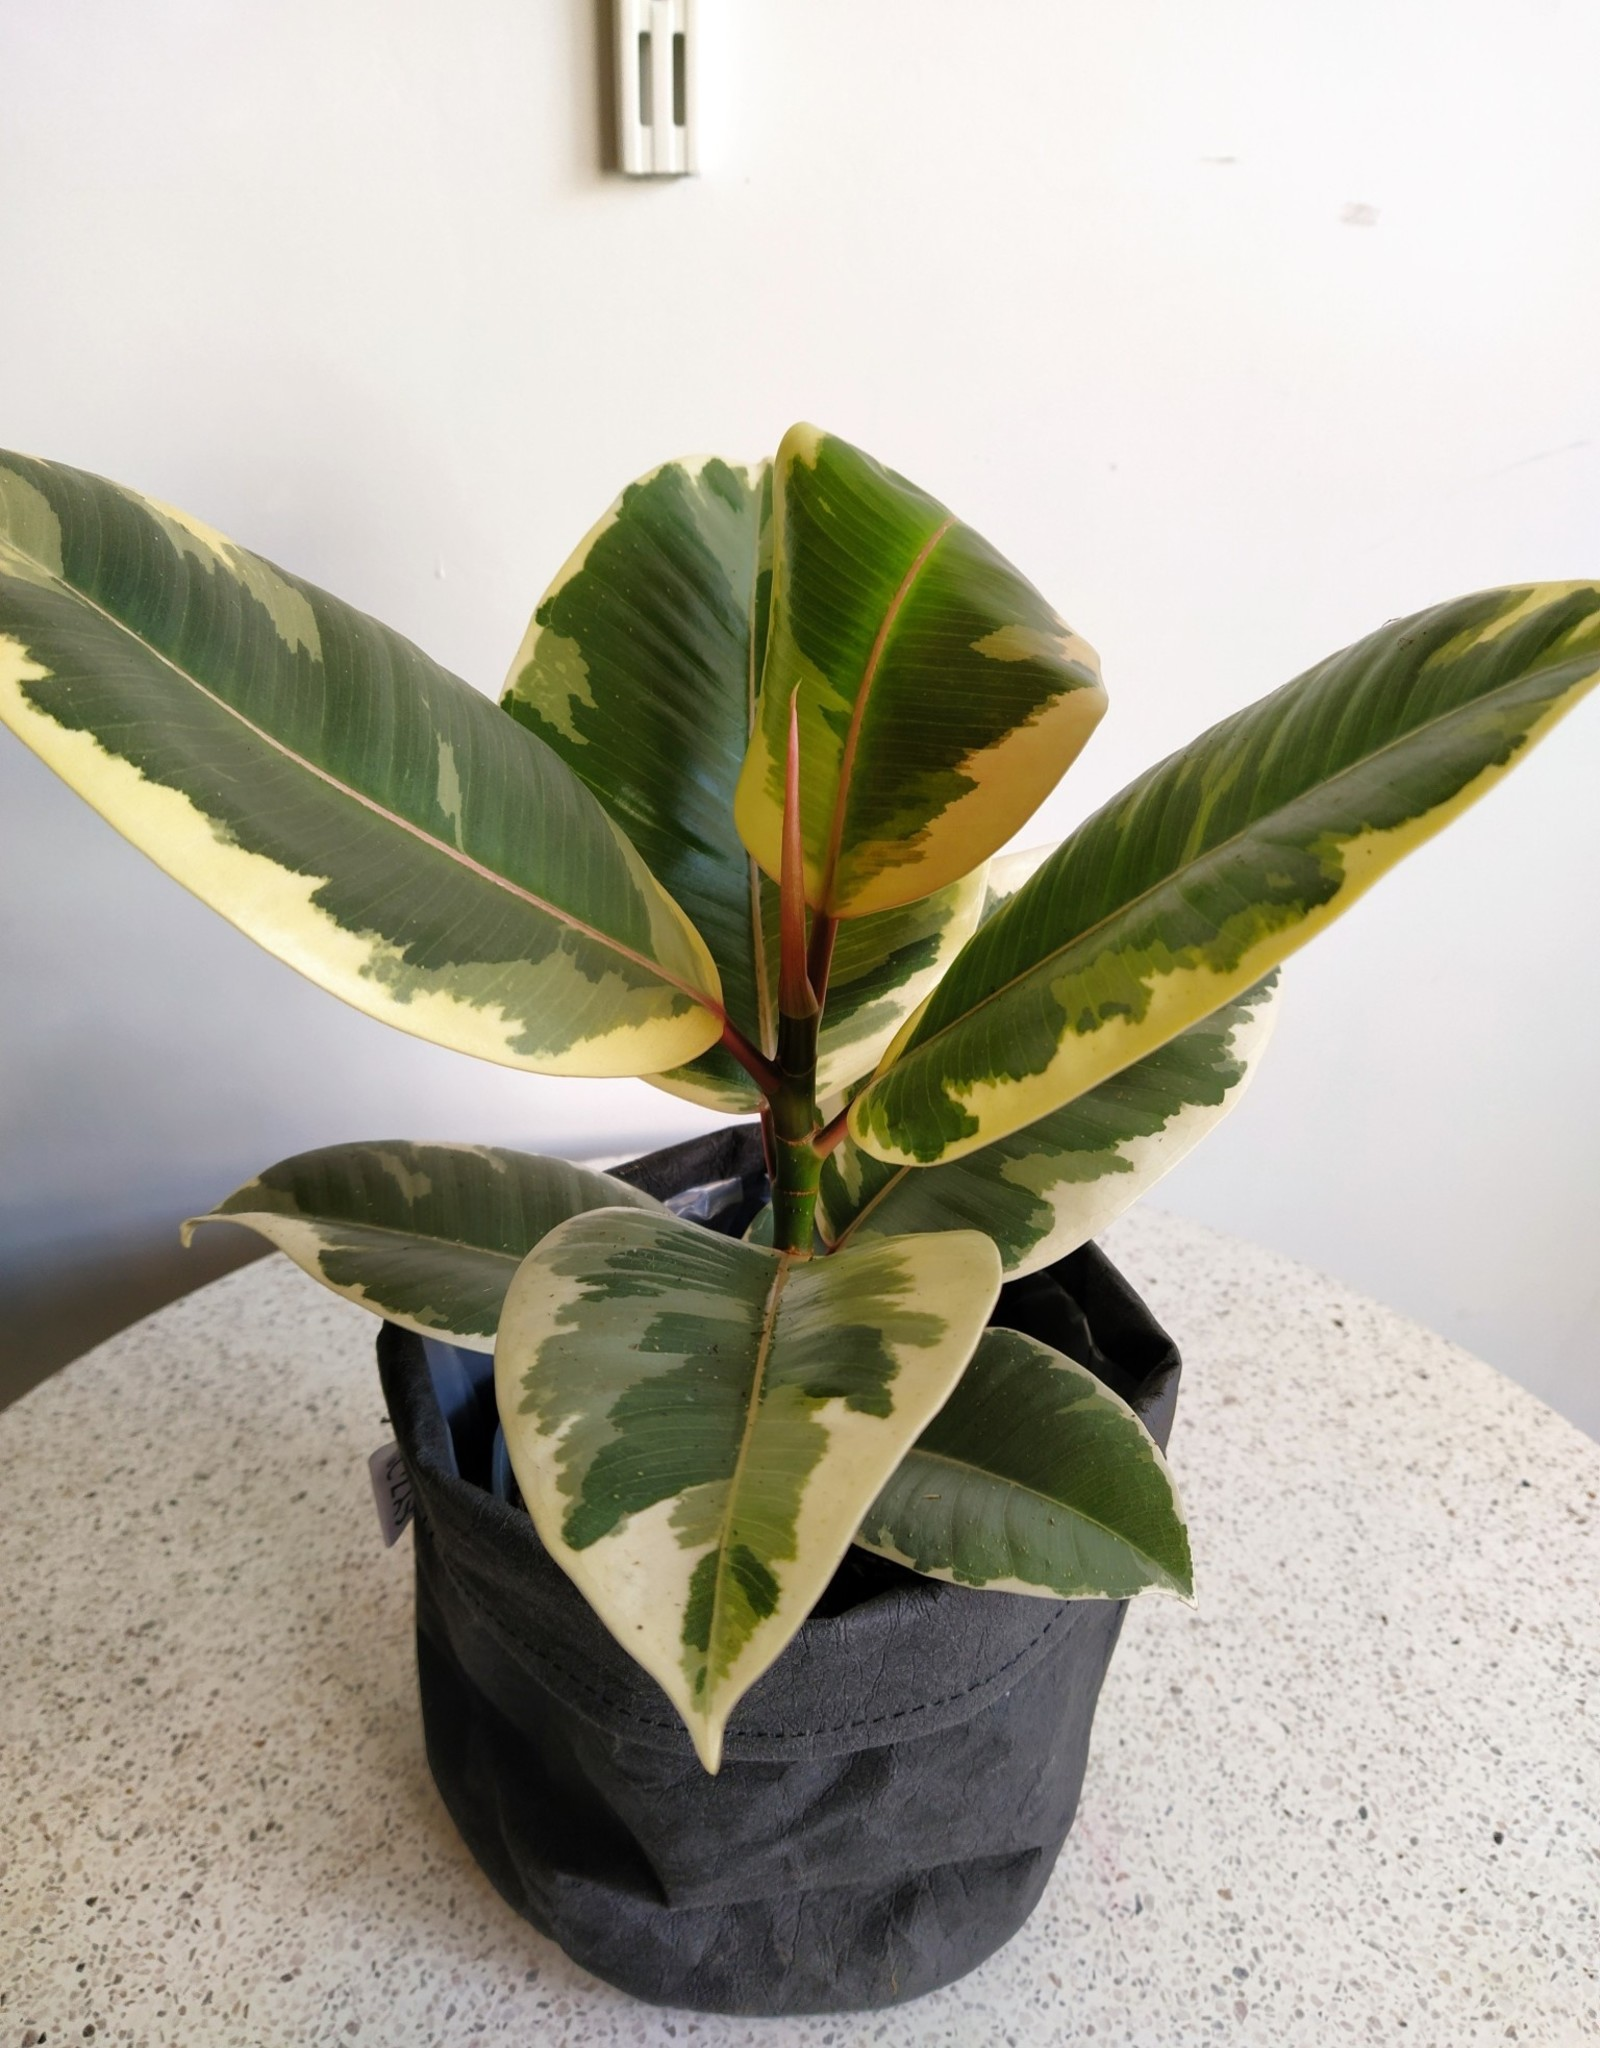 GRUUN Ficus elastica 'Tineke' Ø14 h35